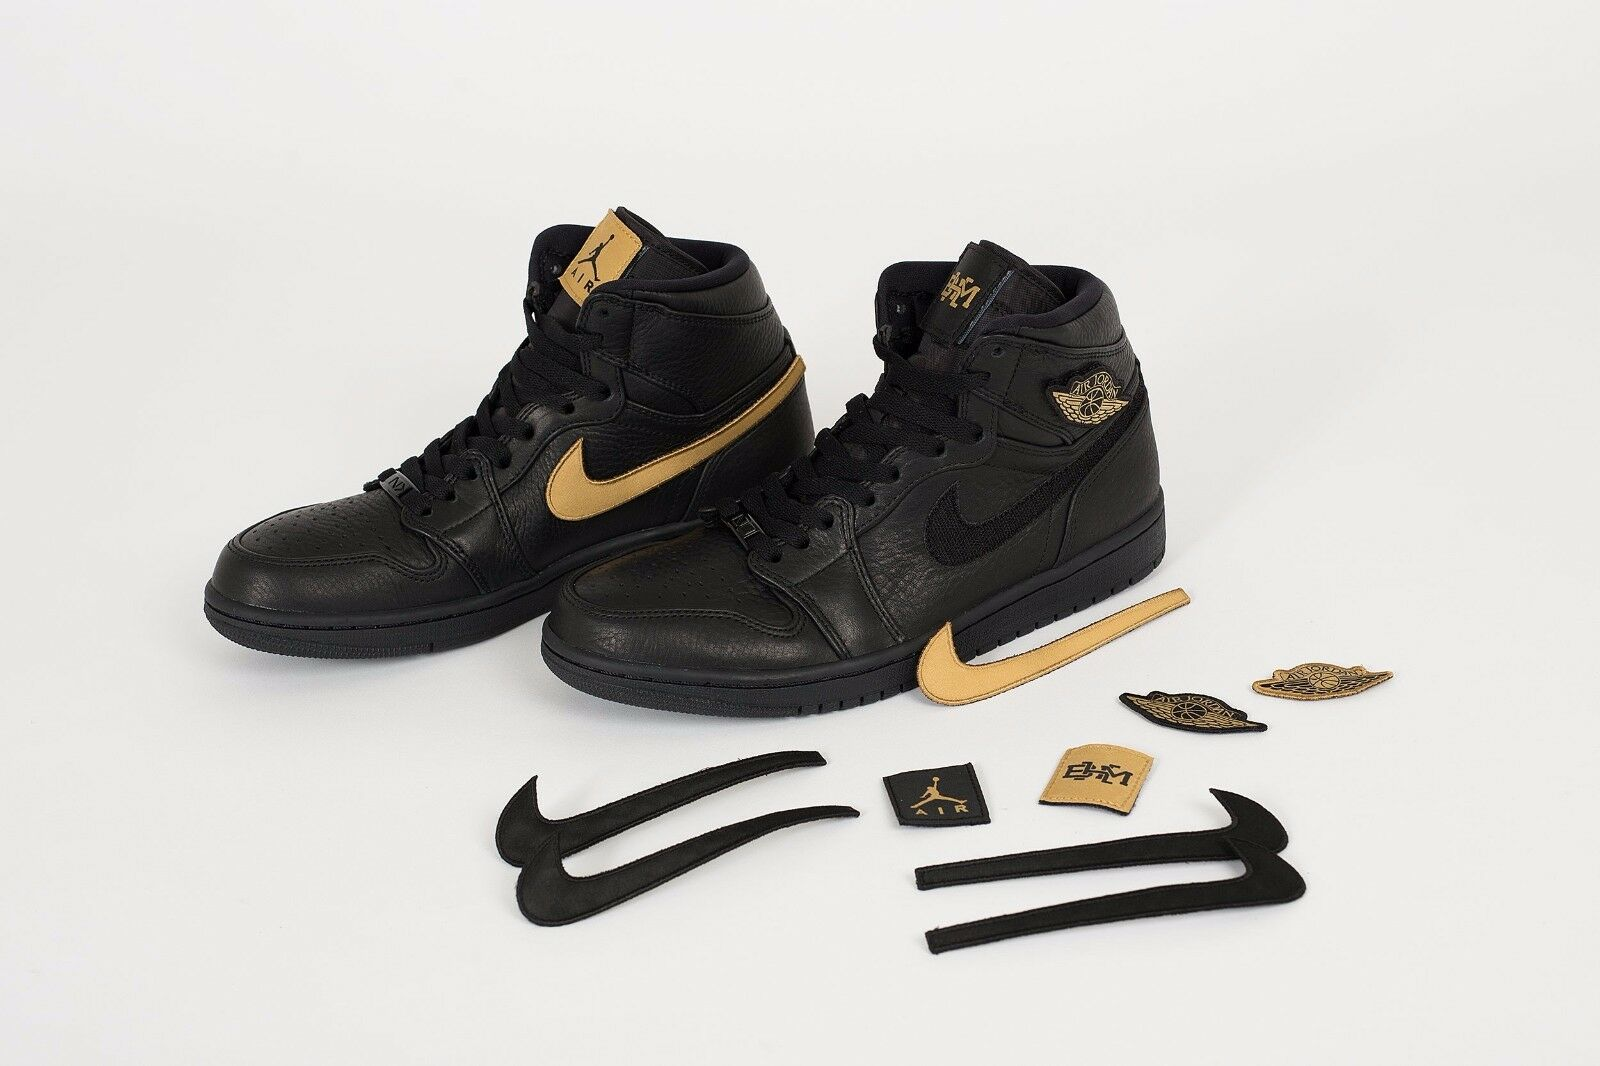 2017 Nike Jordan Air Jordan Nike 1 Retro High BHM Black Gold Size 9. 908656-001 og all star 3741f8